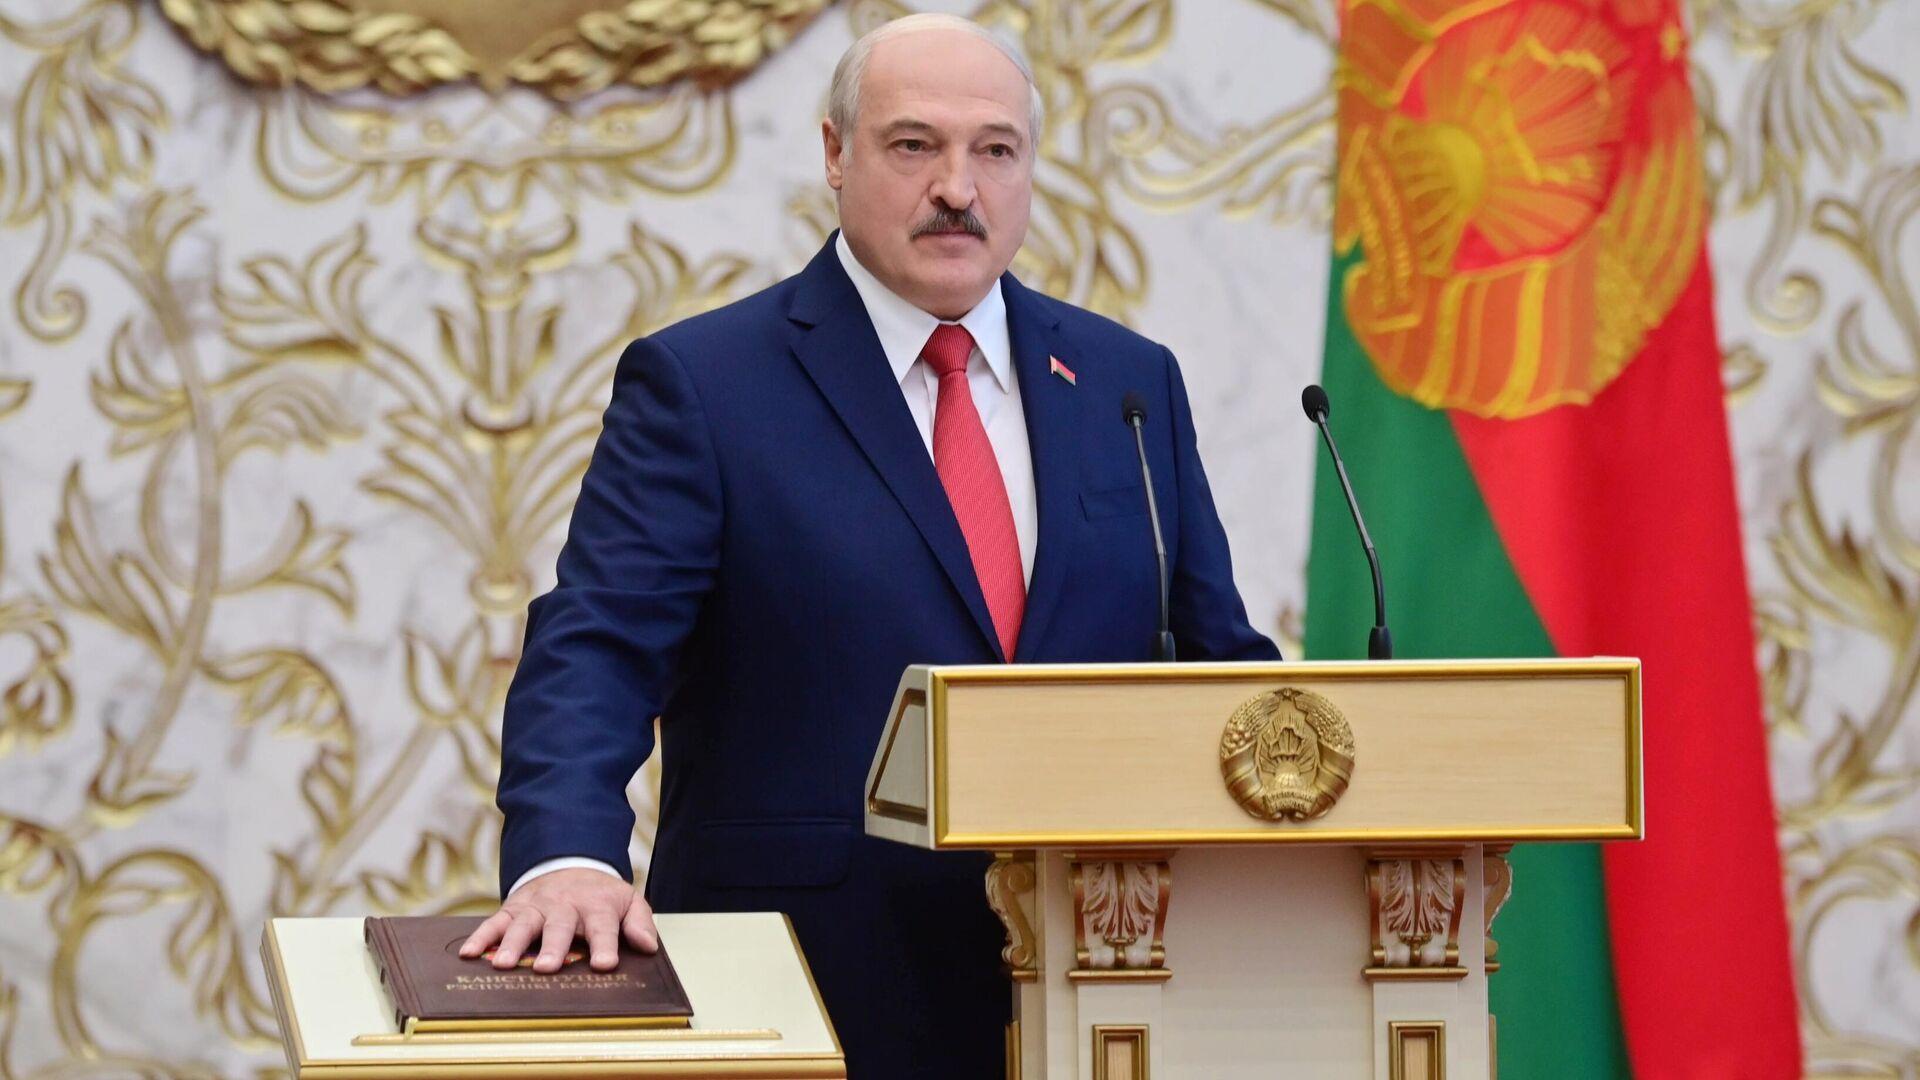 Президент Белоруссии Александр Лукашенко на церемонии инаугурации в Минске - РИА Новости, 1920, 20.10.2020